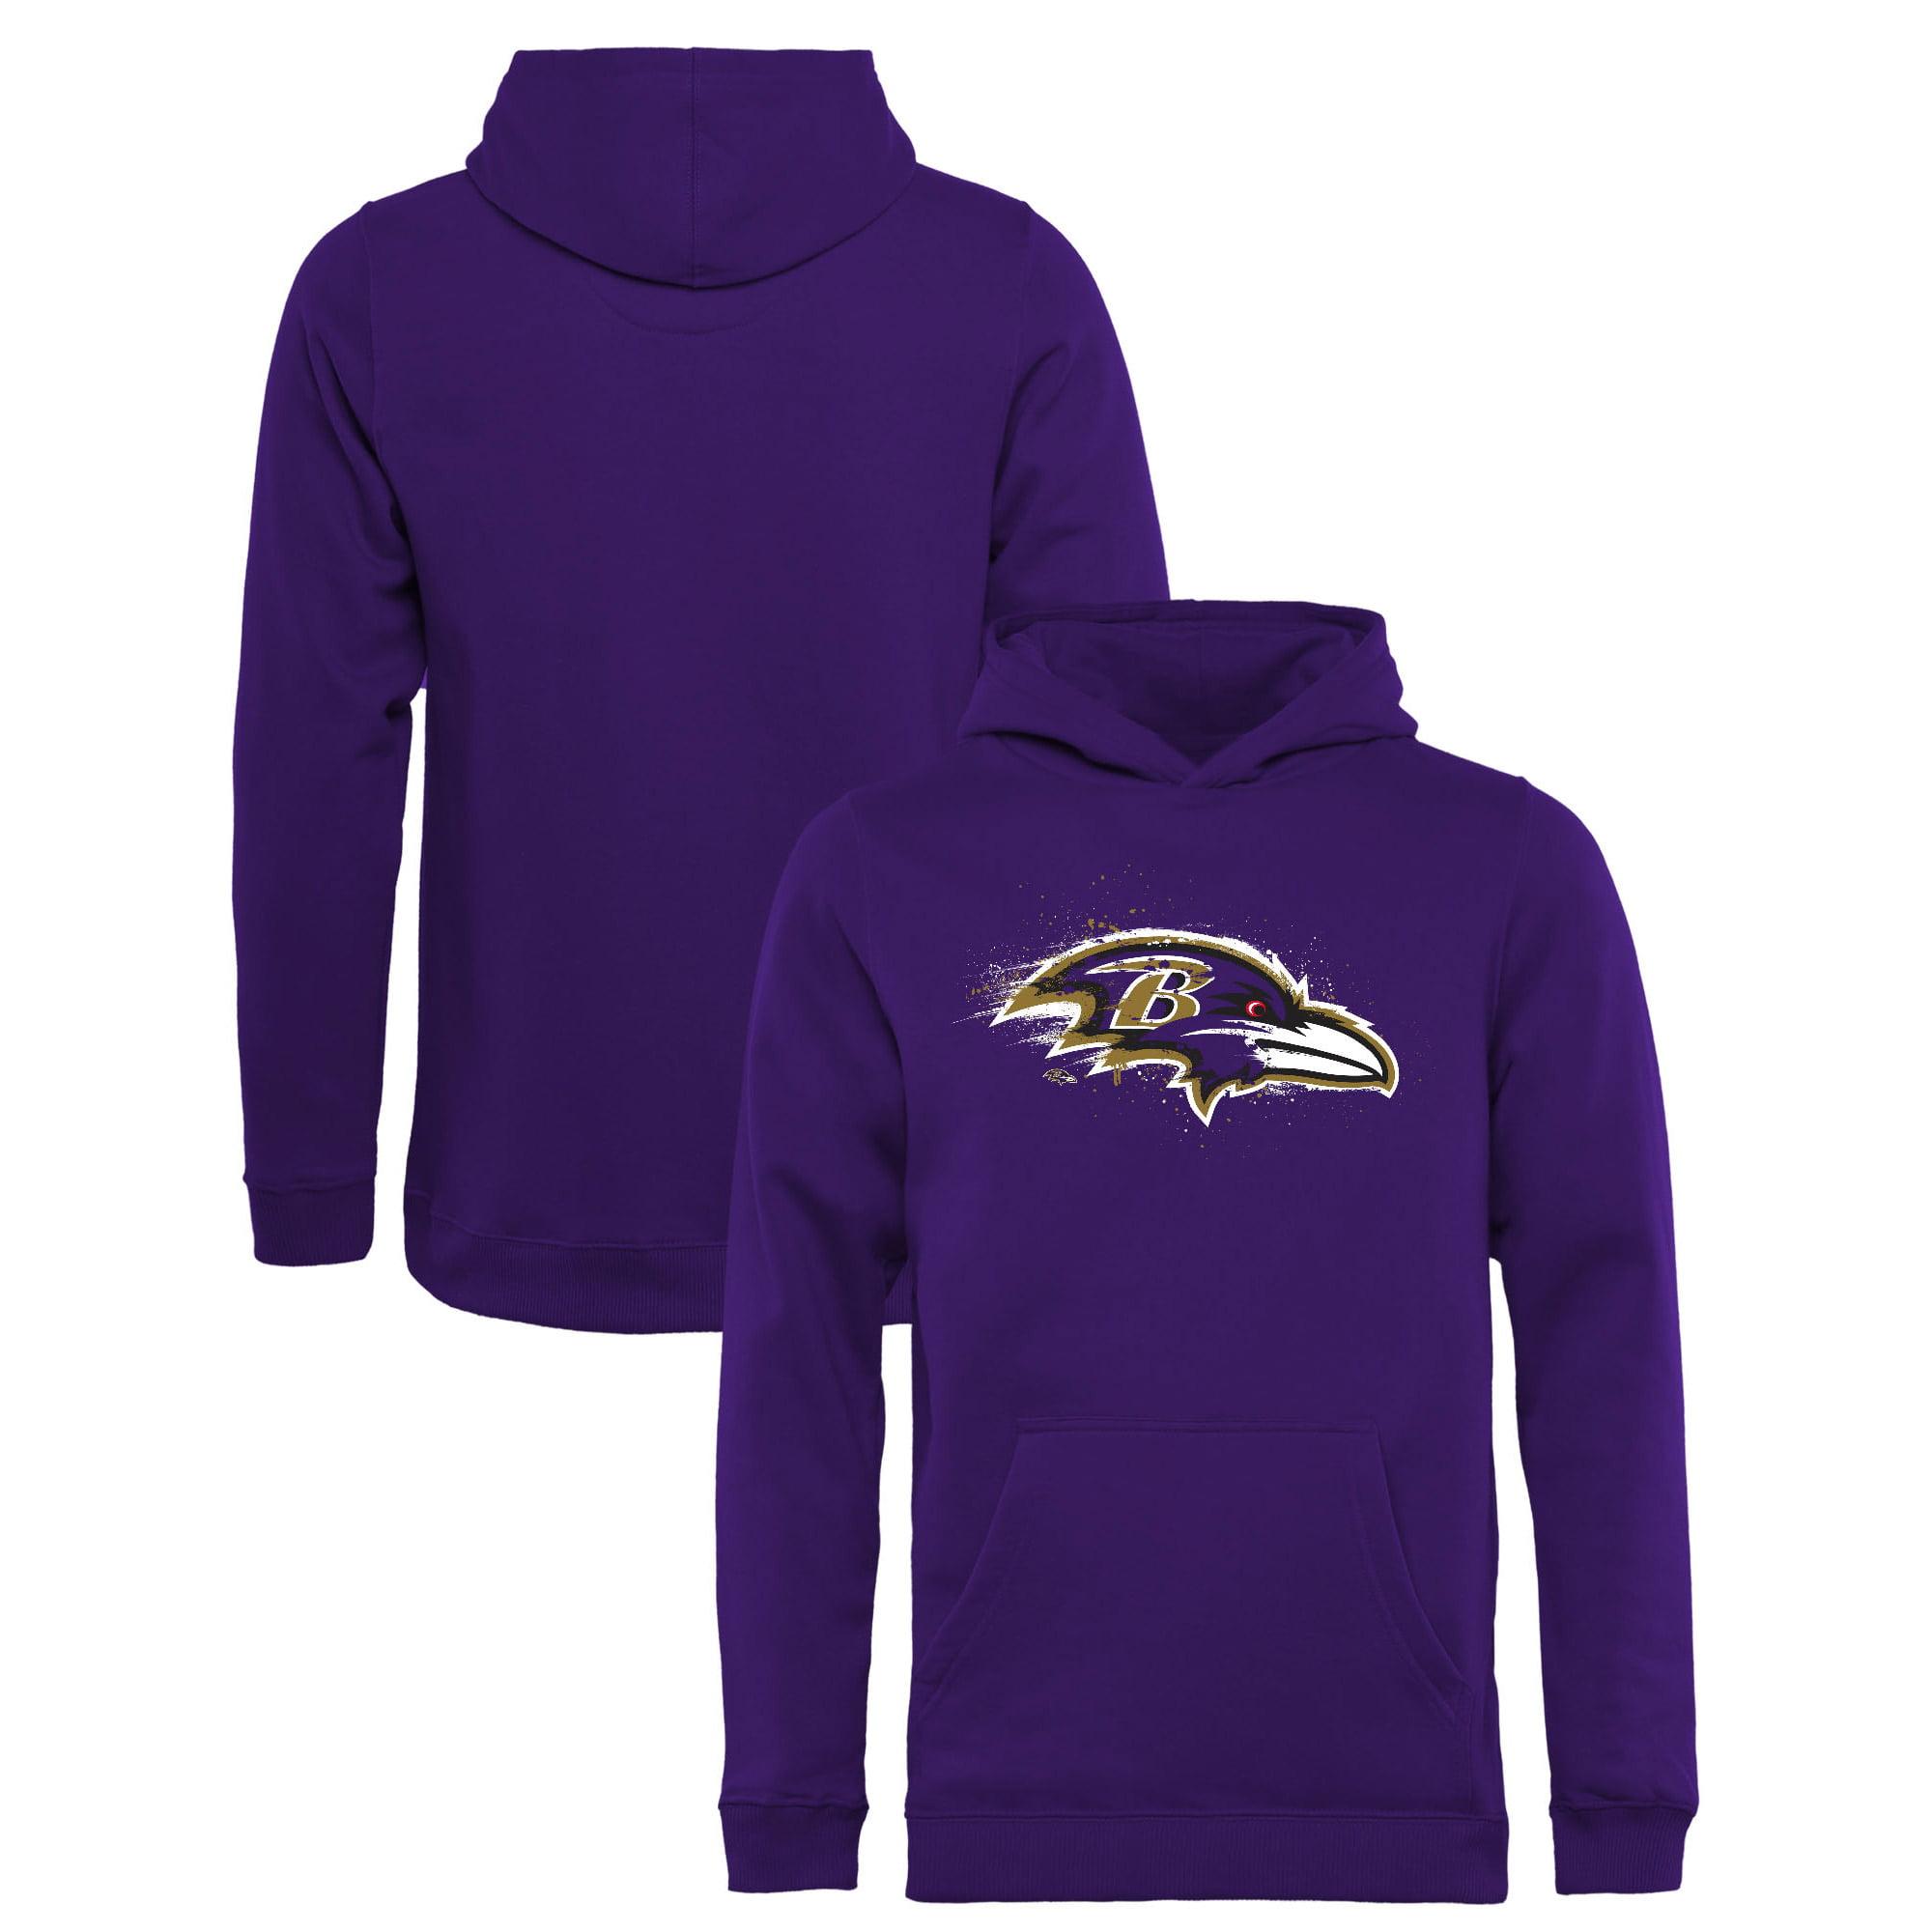 Baltimore Ravens NFL Pro Line by Fanatics Branded Youth Splatter Logo Pullover Hoodie - Purple